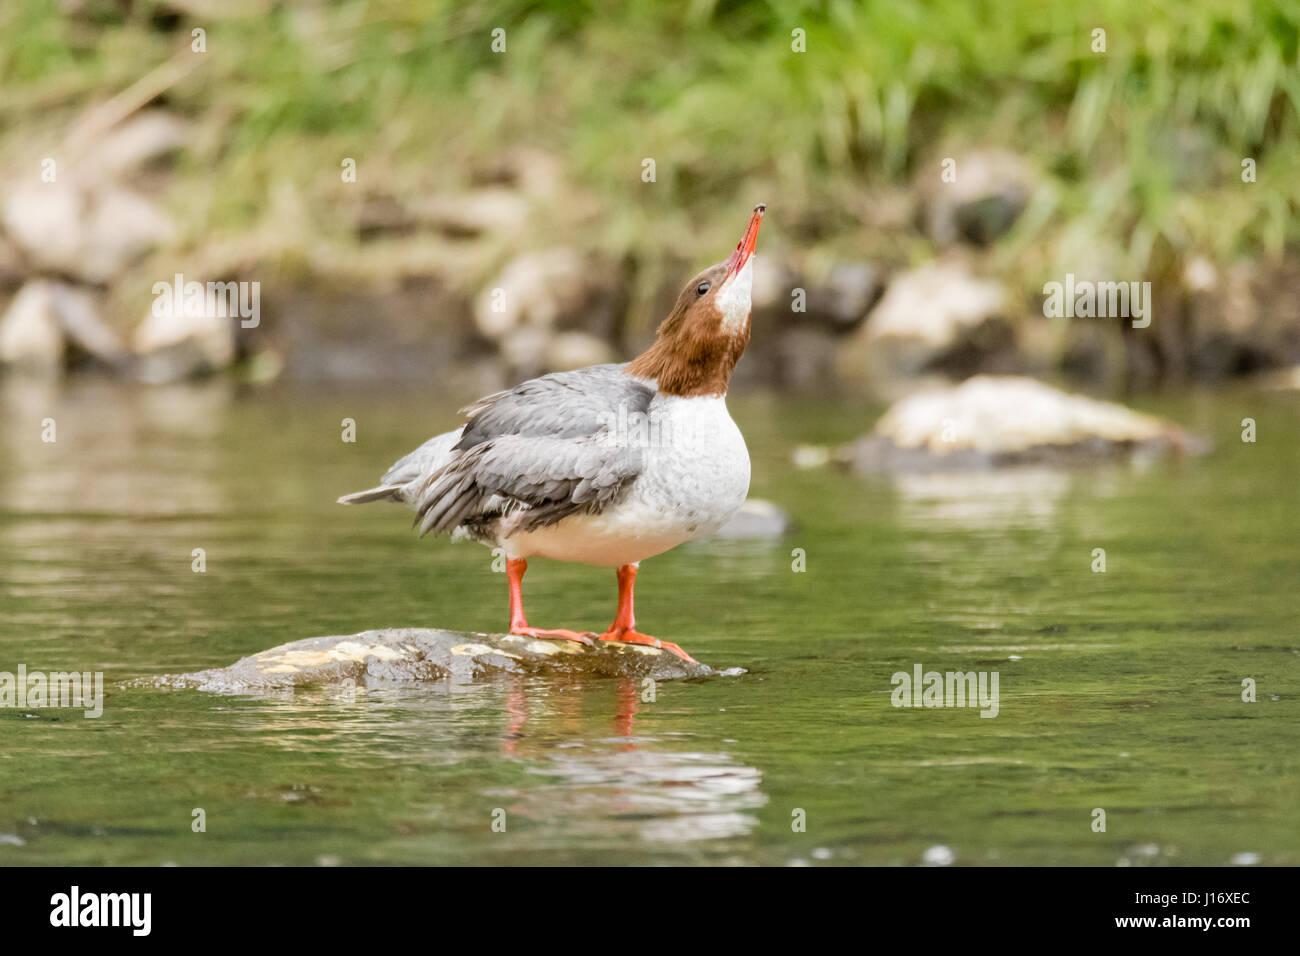 Goosander (Mergus merganser) female drinking. Sawbill duck in the family Anatidae, with crest and serated bill, - Stock Image